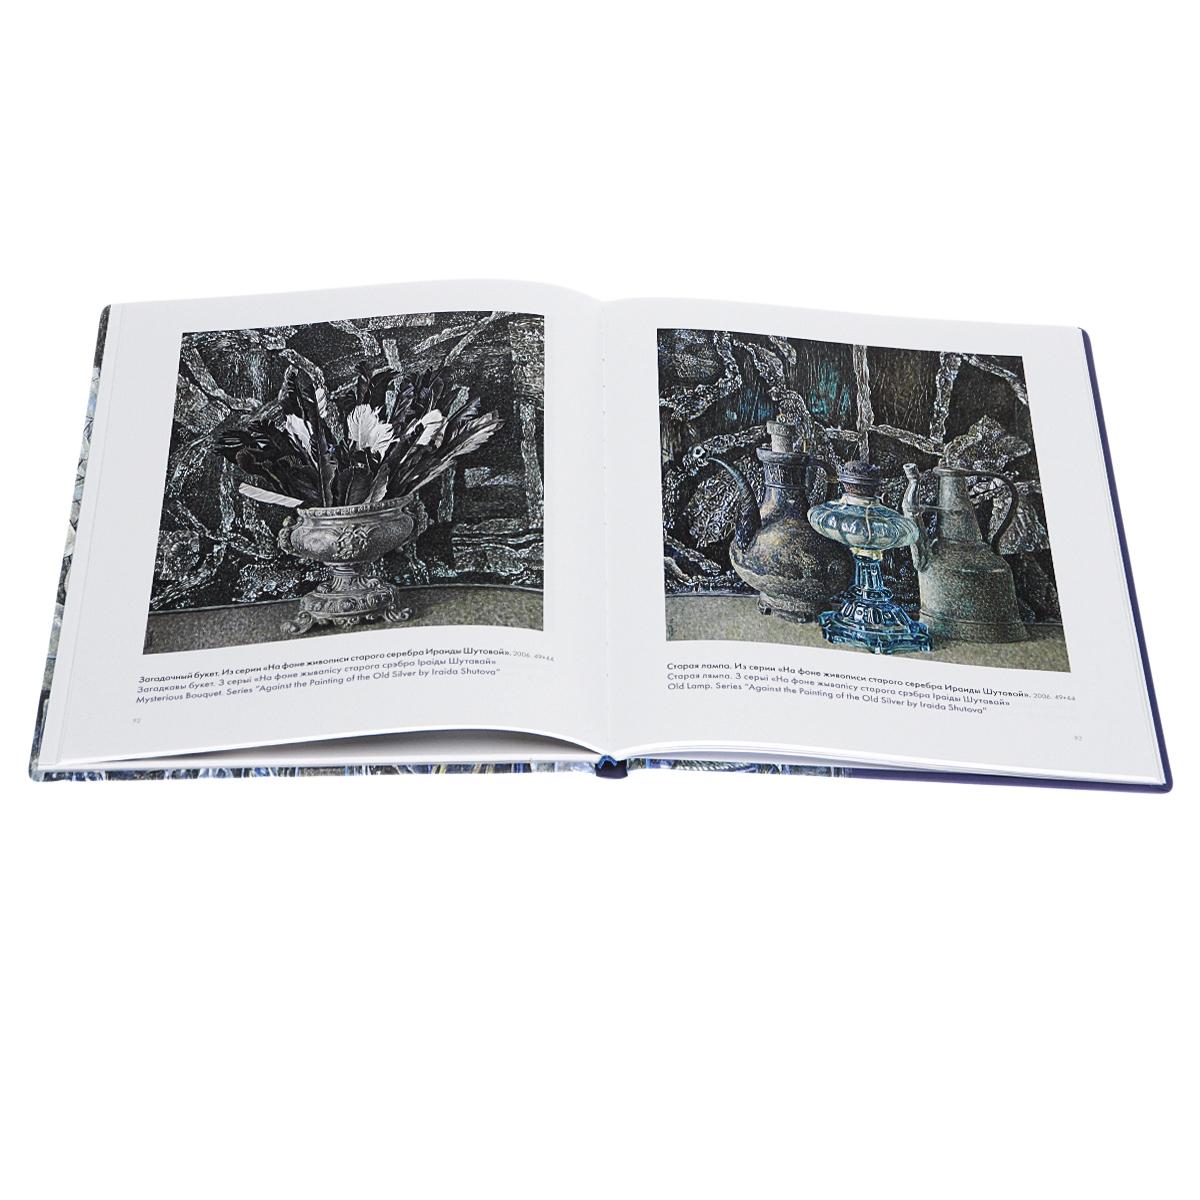 Геннадий Шутов. Акварели / Геннадзь Шутау. Акварэл i / Gennady Shutov: Watercolors